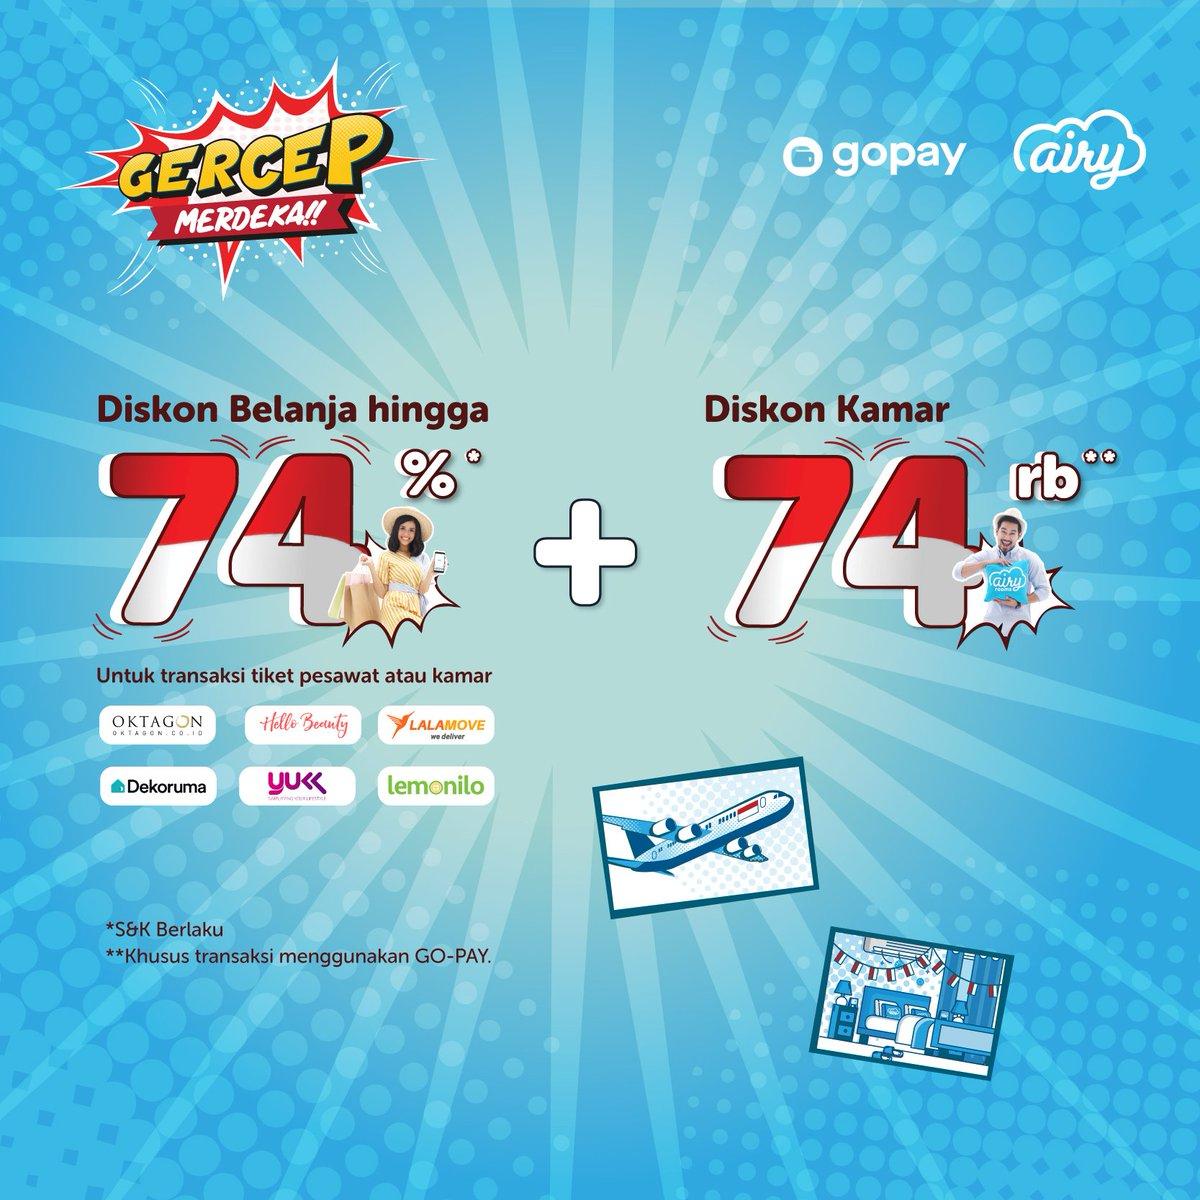 Airy Indonesia On Twitter Promo Liburan Spesial Untuk